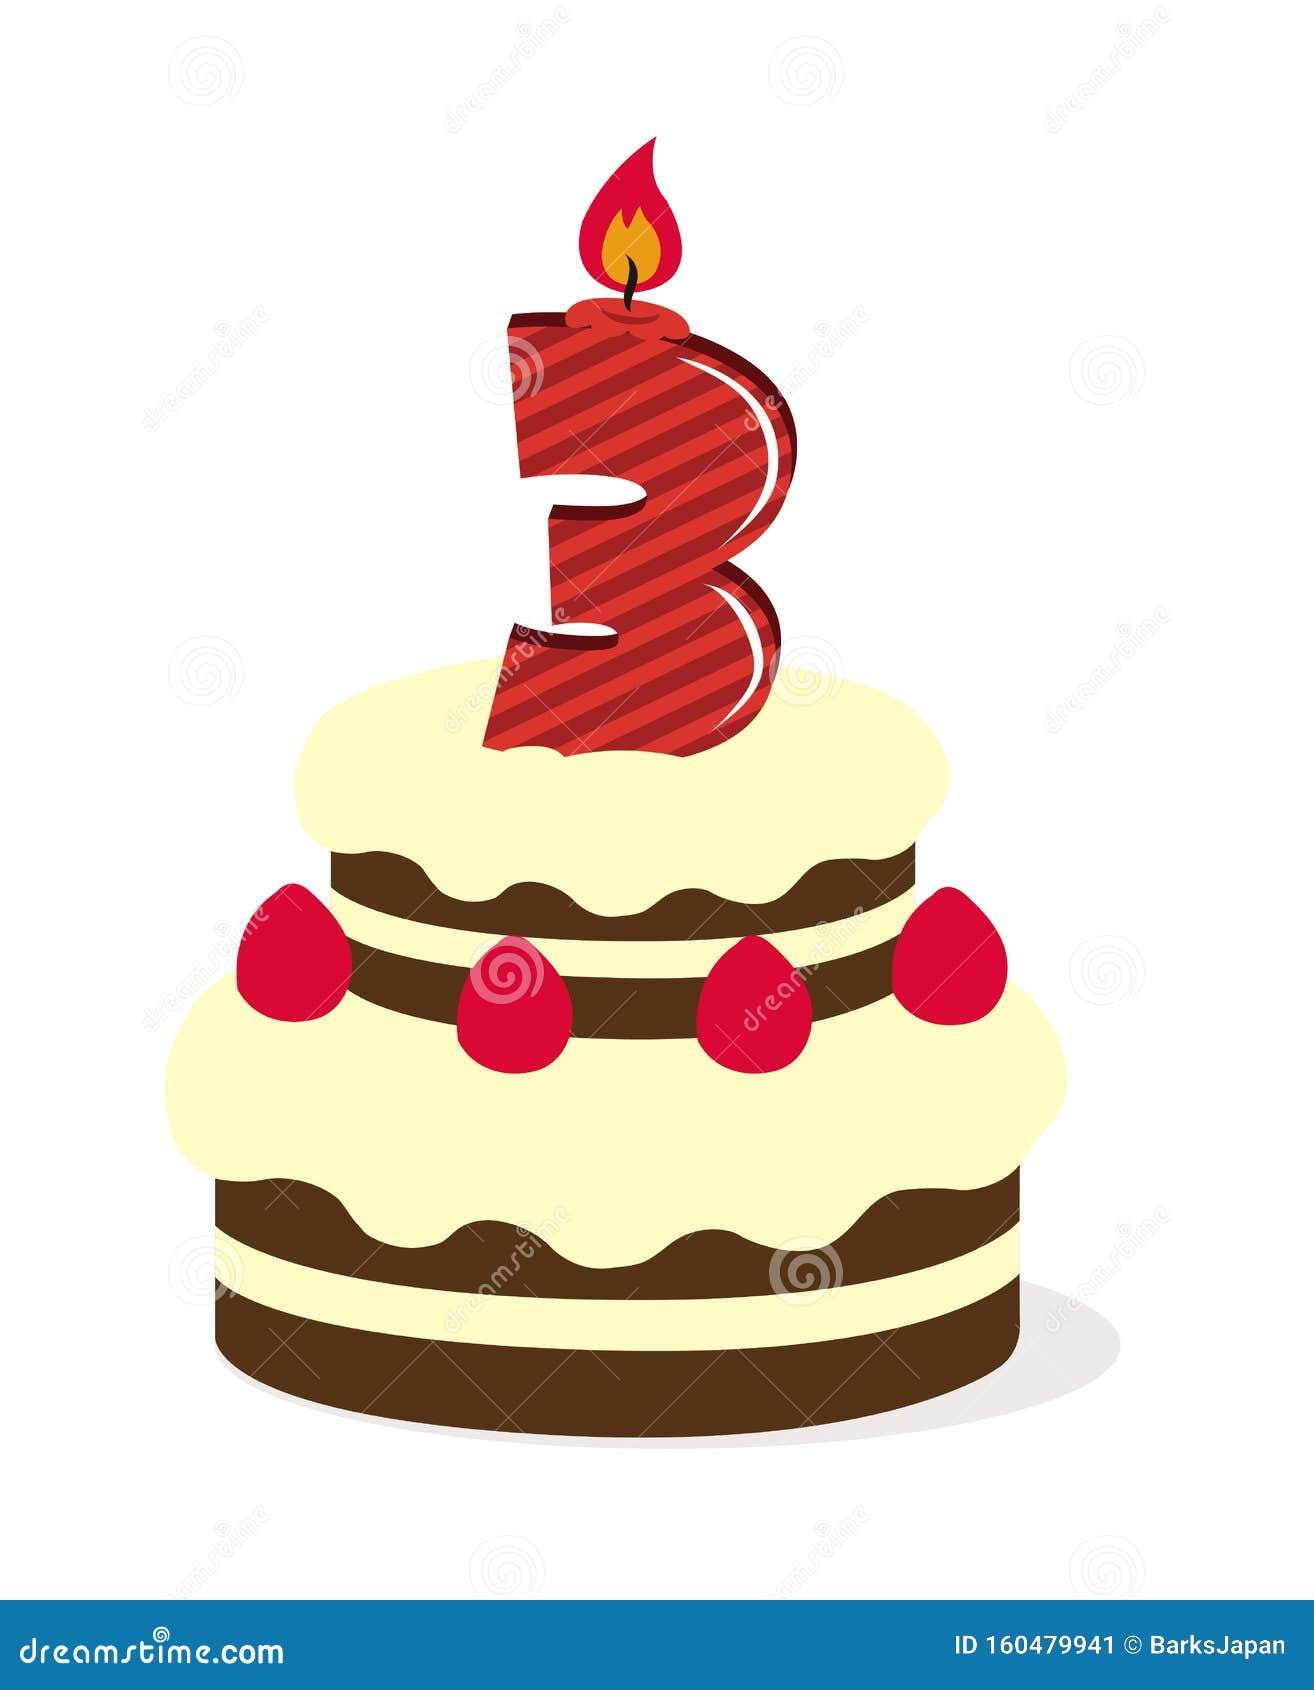 Superb Birthday Cake Illustration 3 Years Old Stock Vector Birthday Cards Printable Inklcafe Filternl